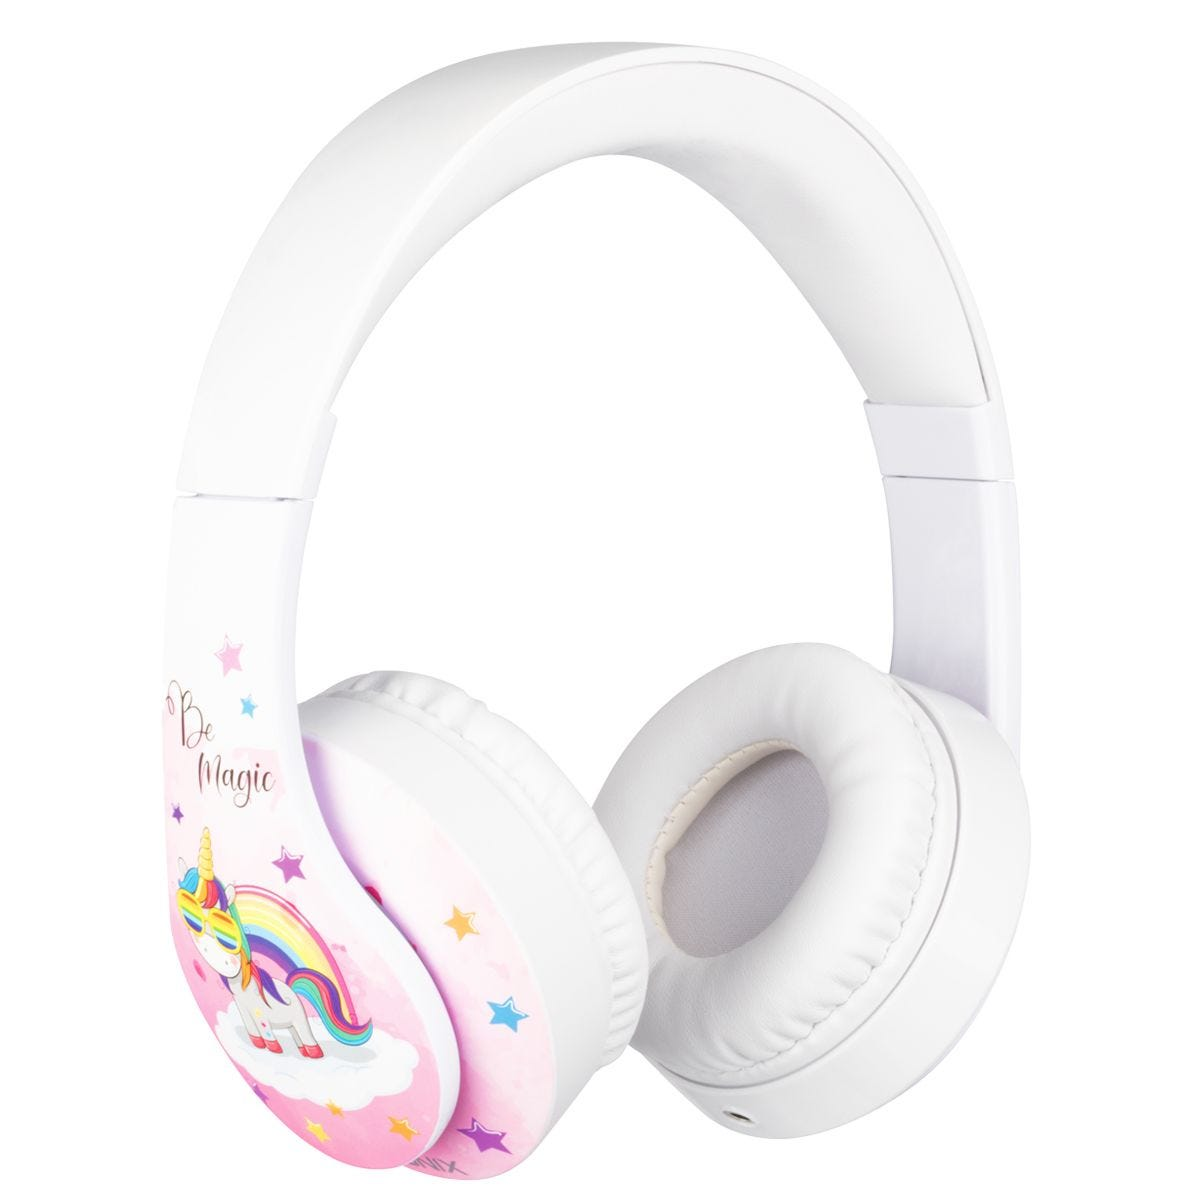 Konix Uni-k Unicorn Gaming Headset - Be Magic